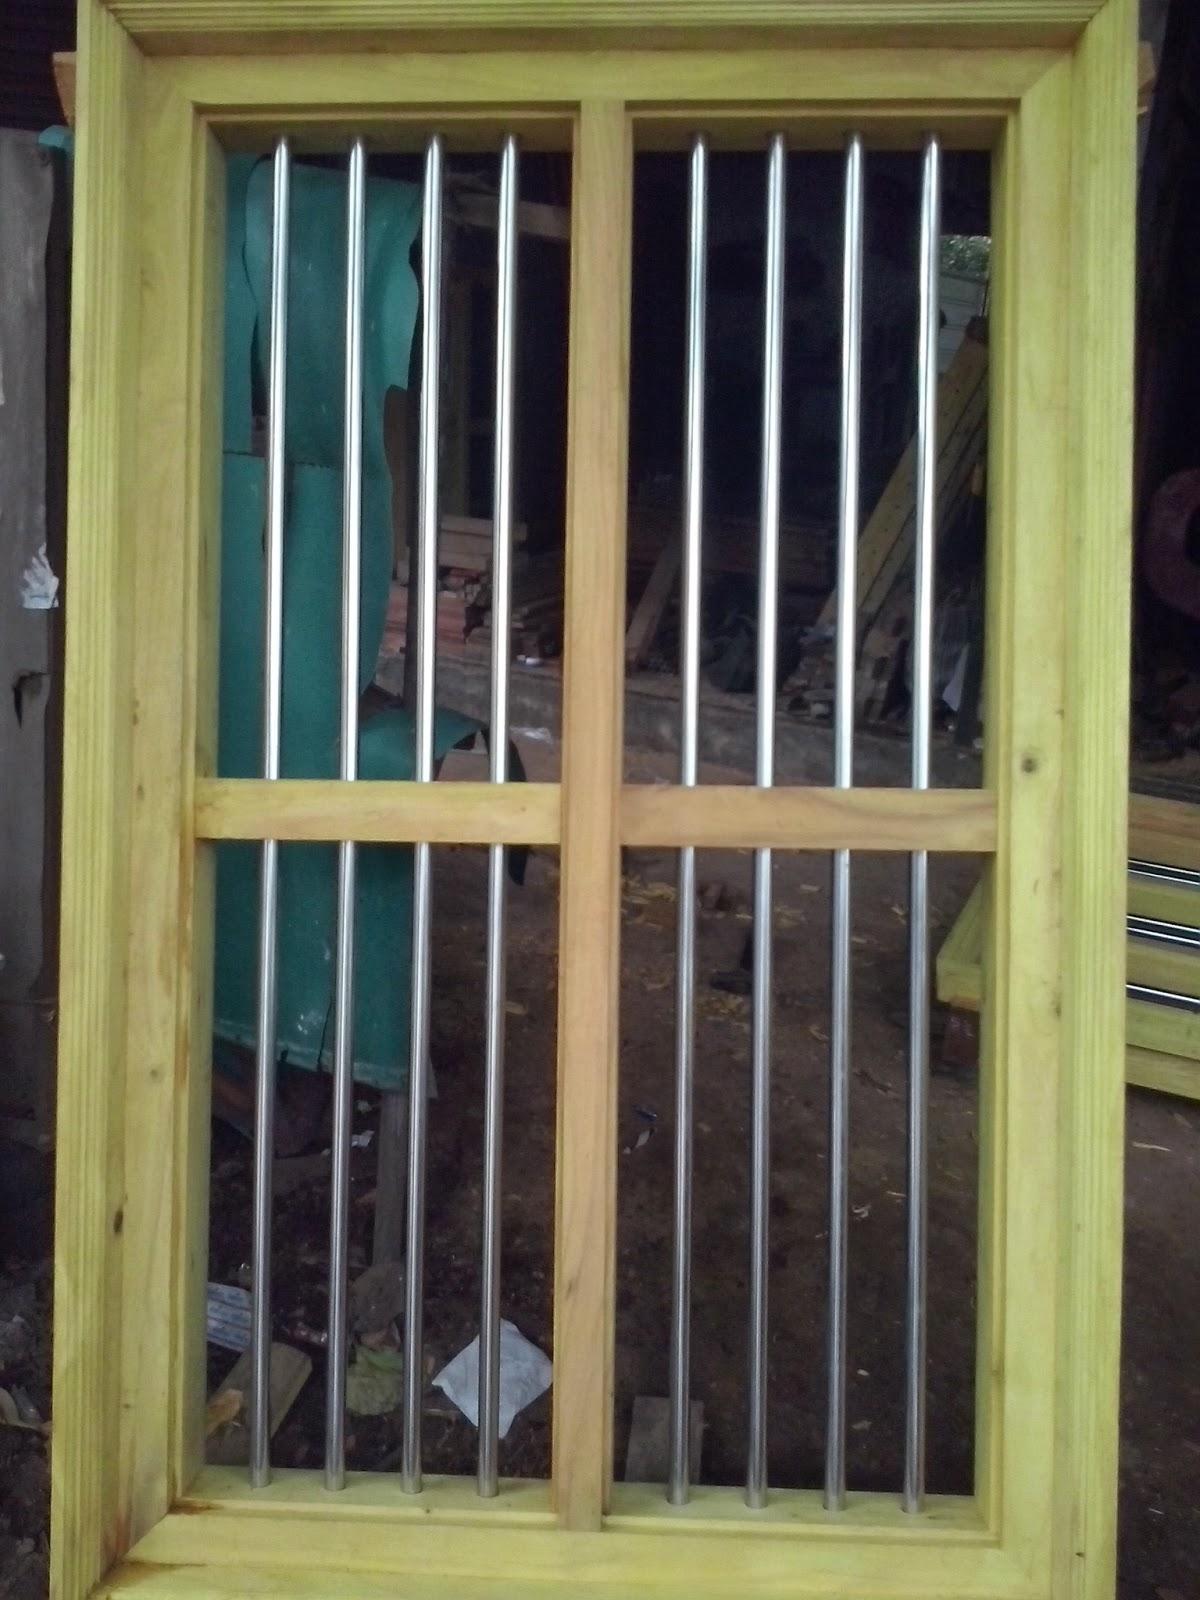 Home window painting kerala crowdbuild for for Kerala home window design